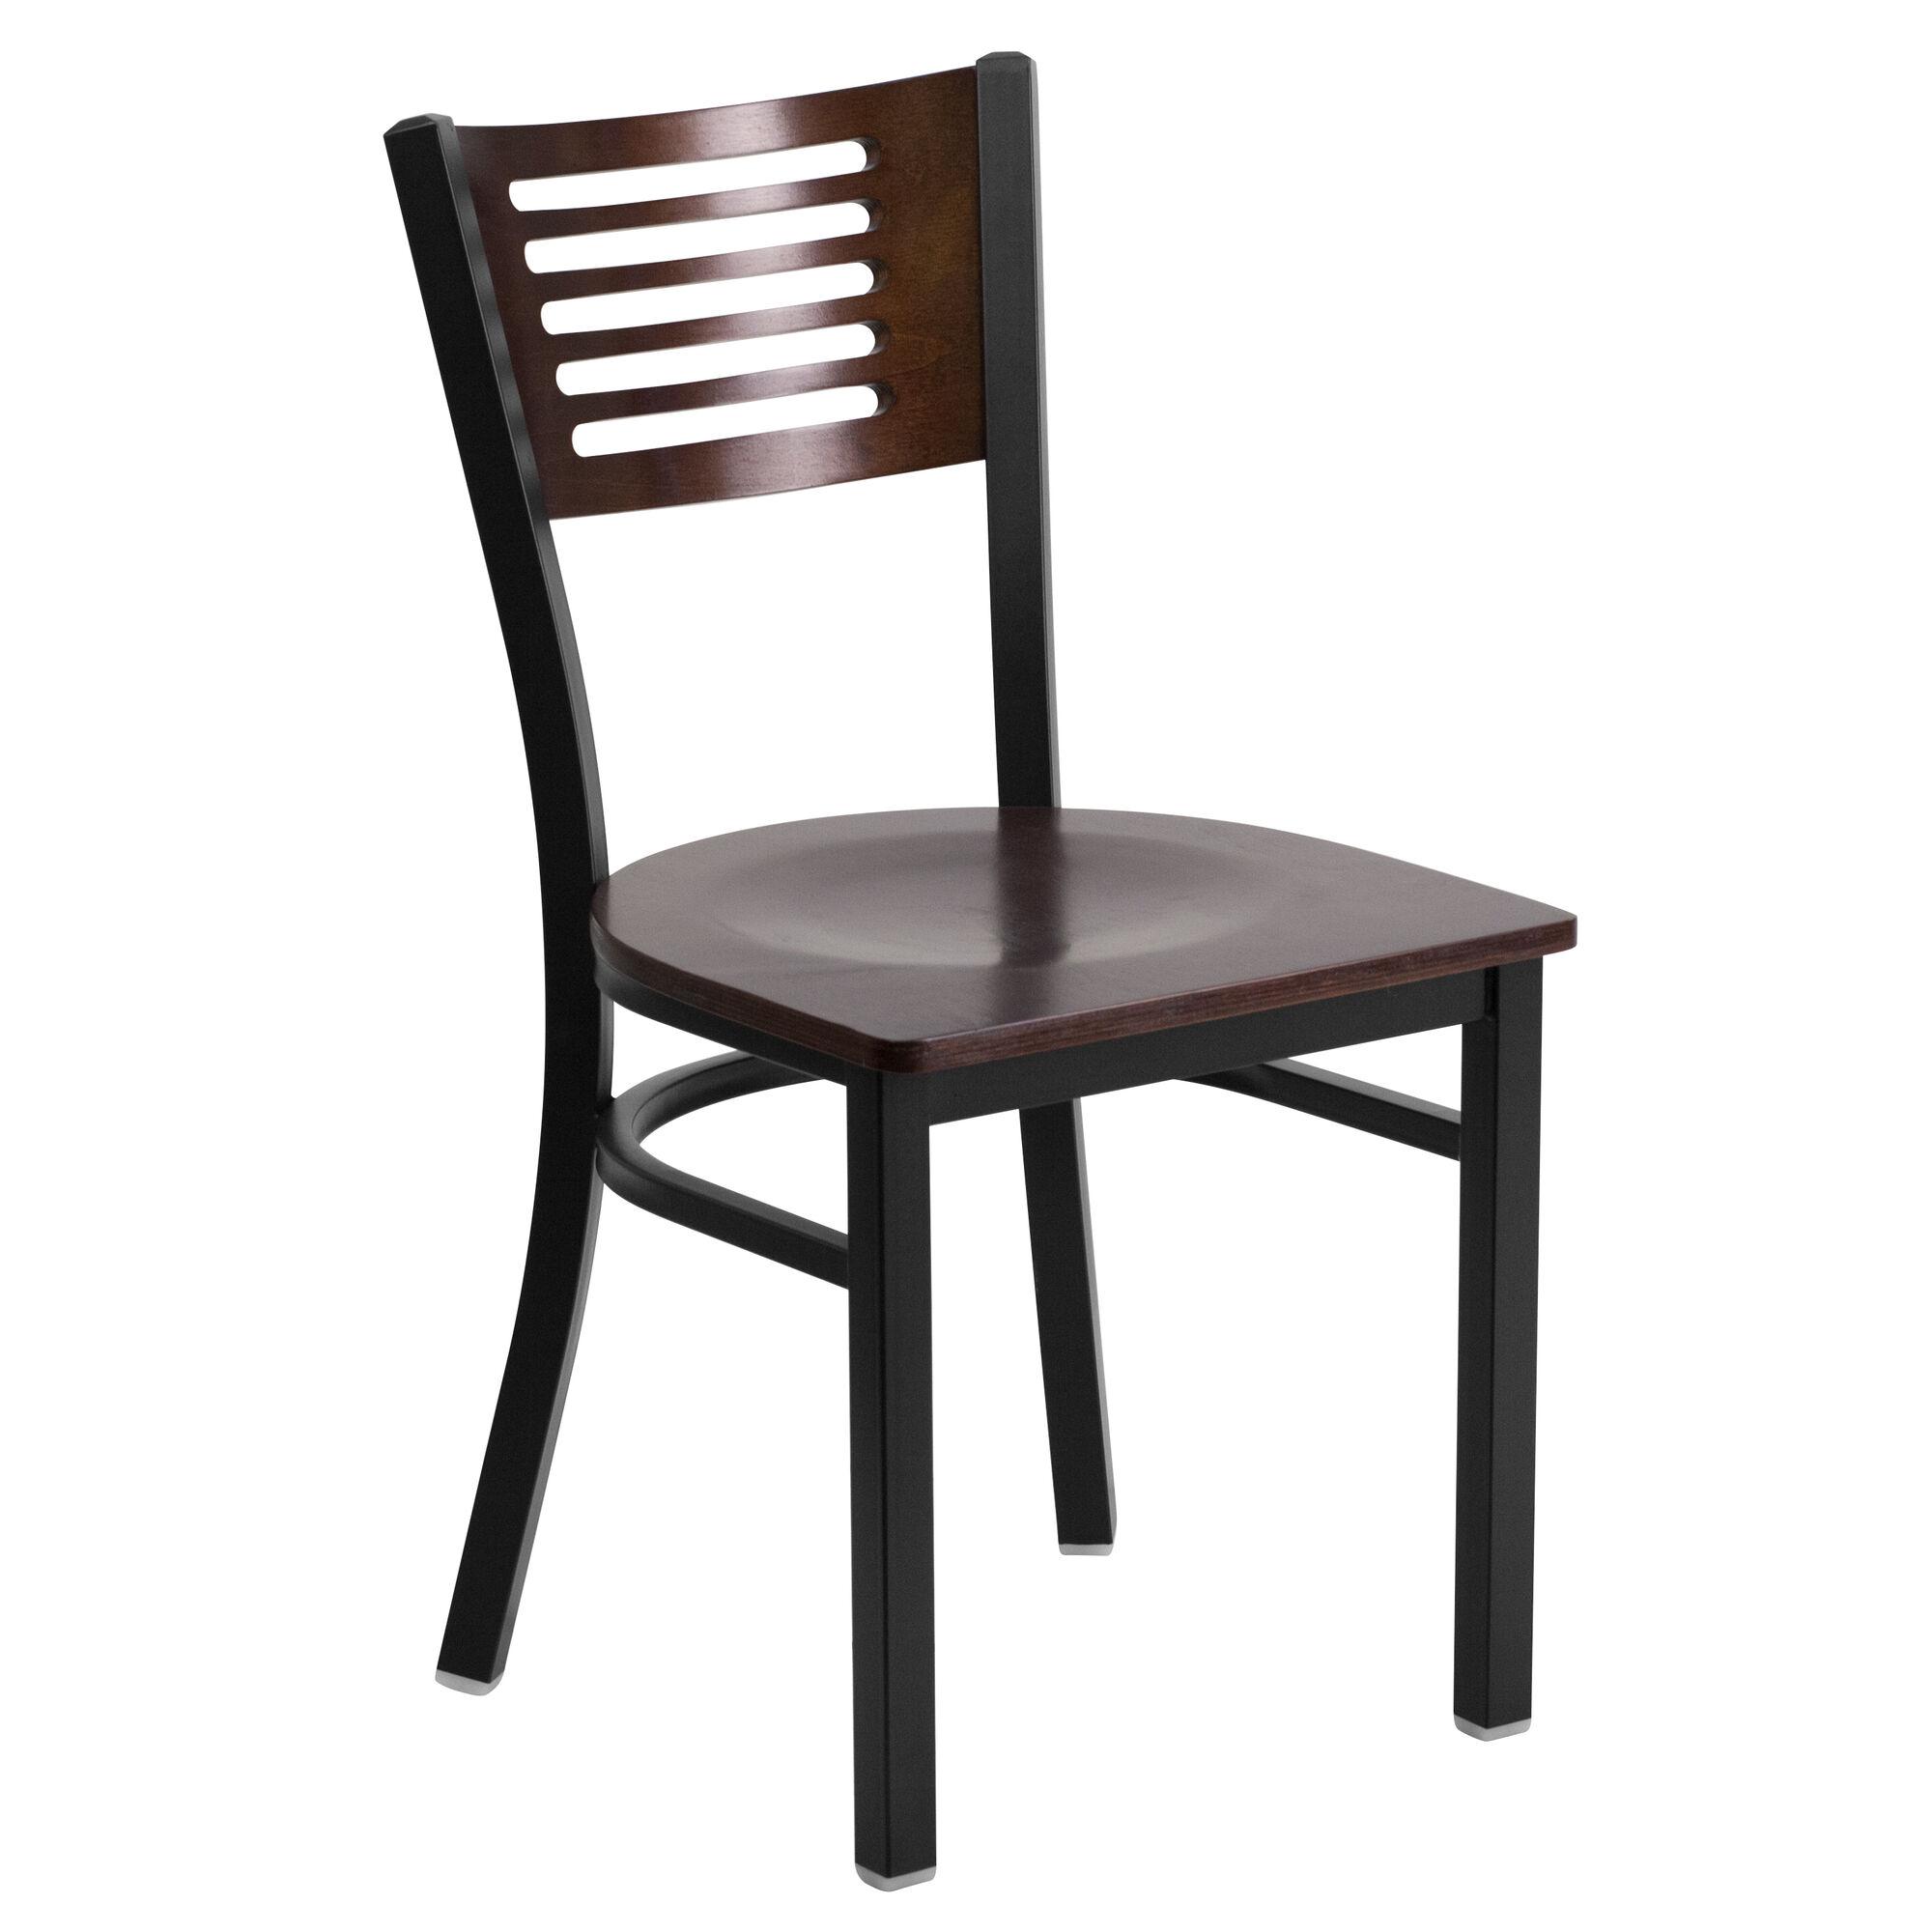 Bk Wal Slat Chair Wood Seat Bfdh 90156 Wal Tdr Bizchair Com